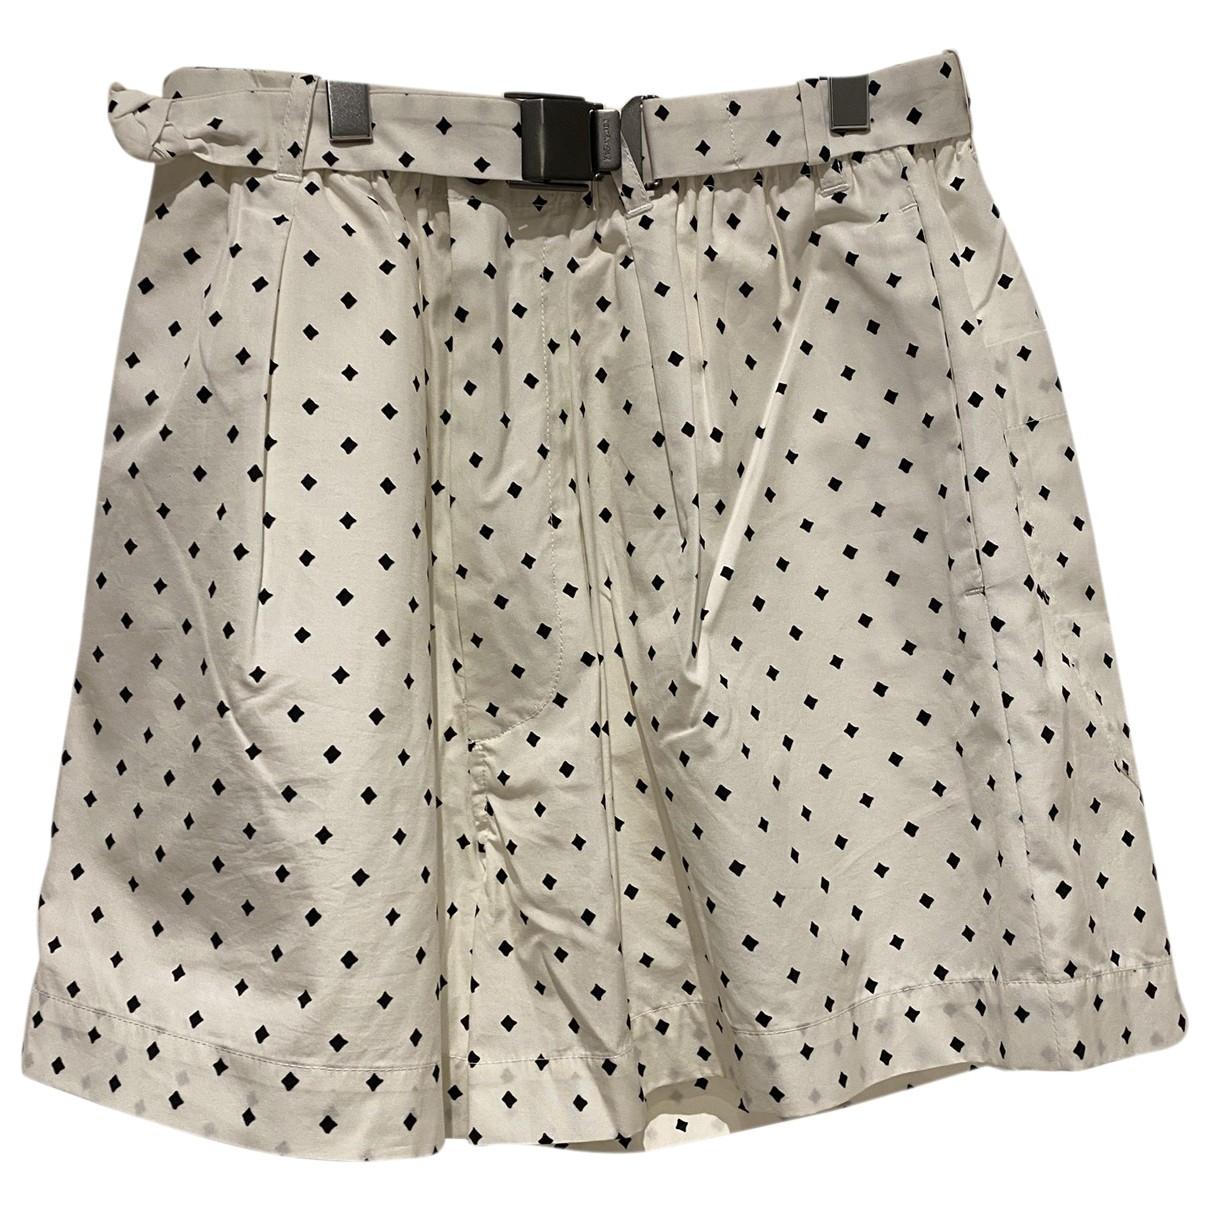 Pantalon corto Yves Saint Laurent